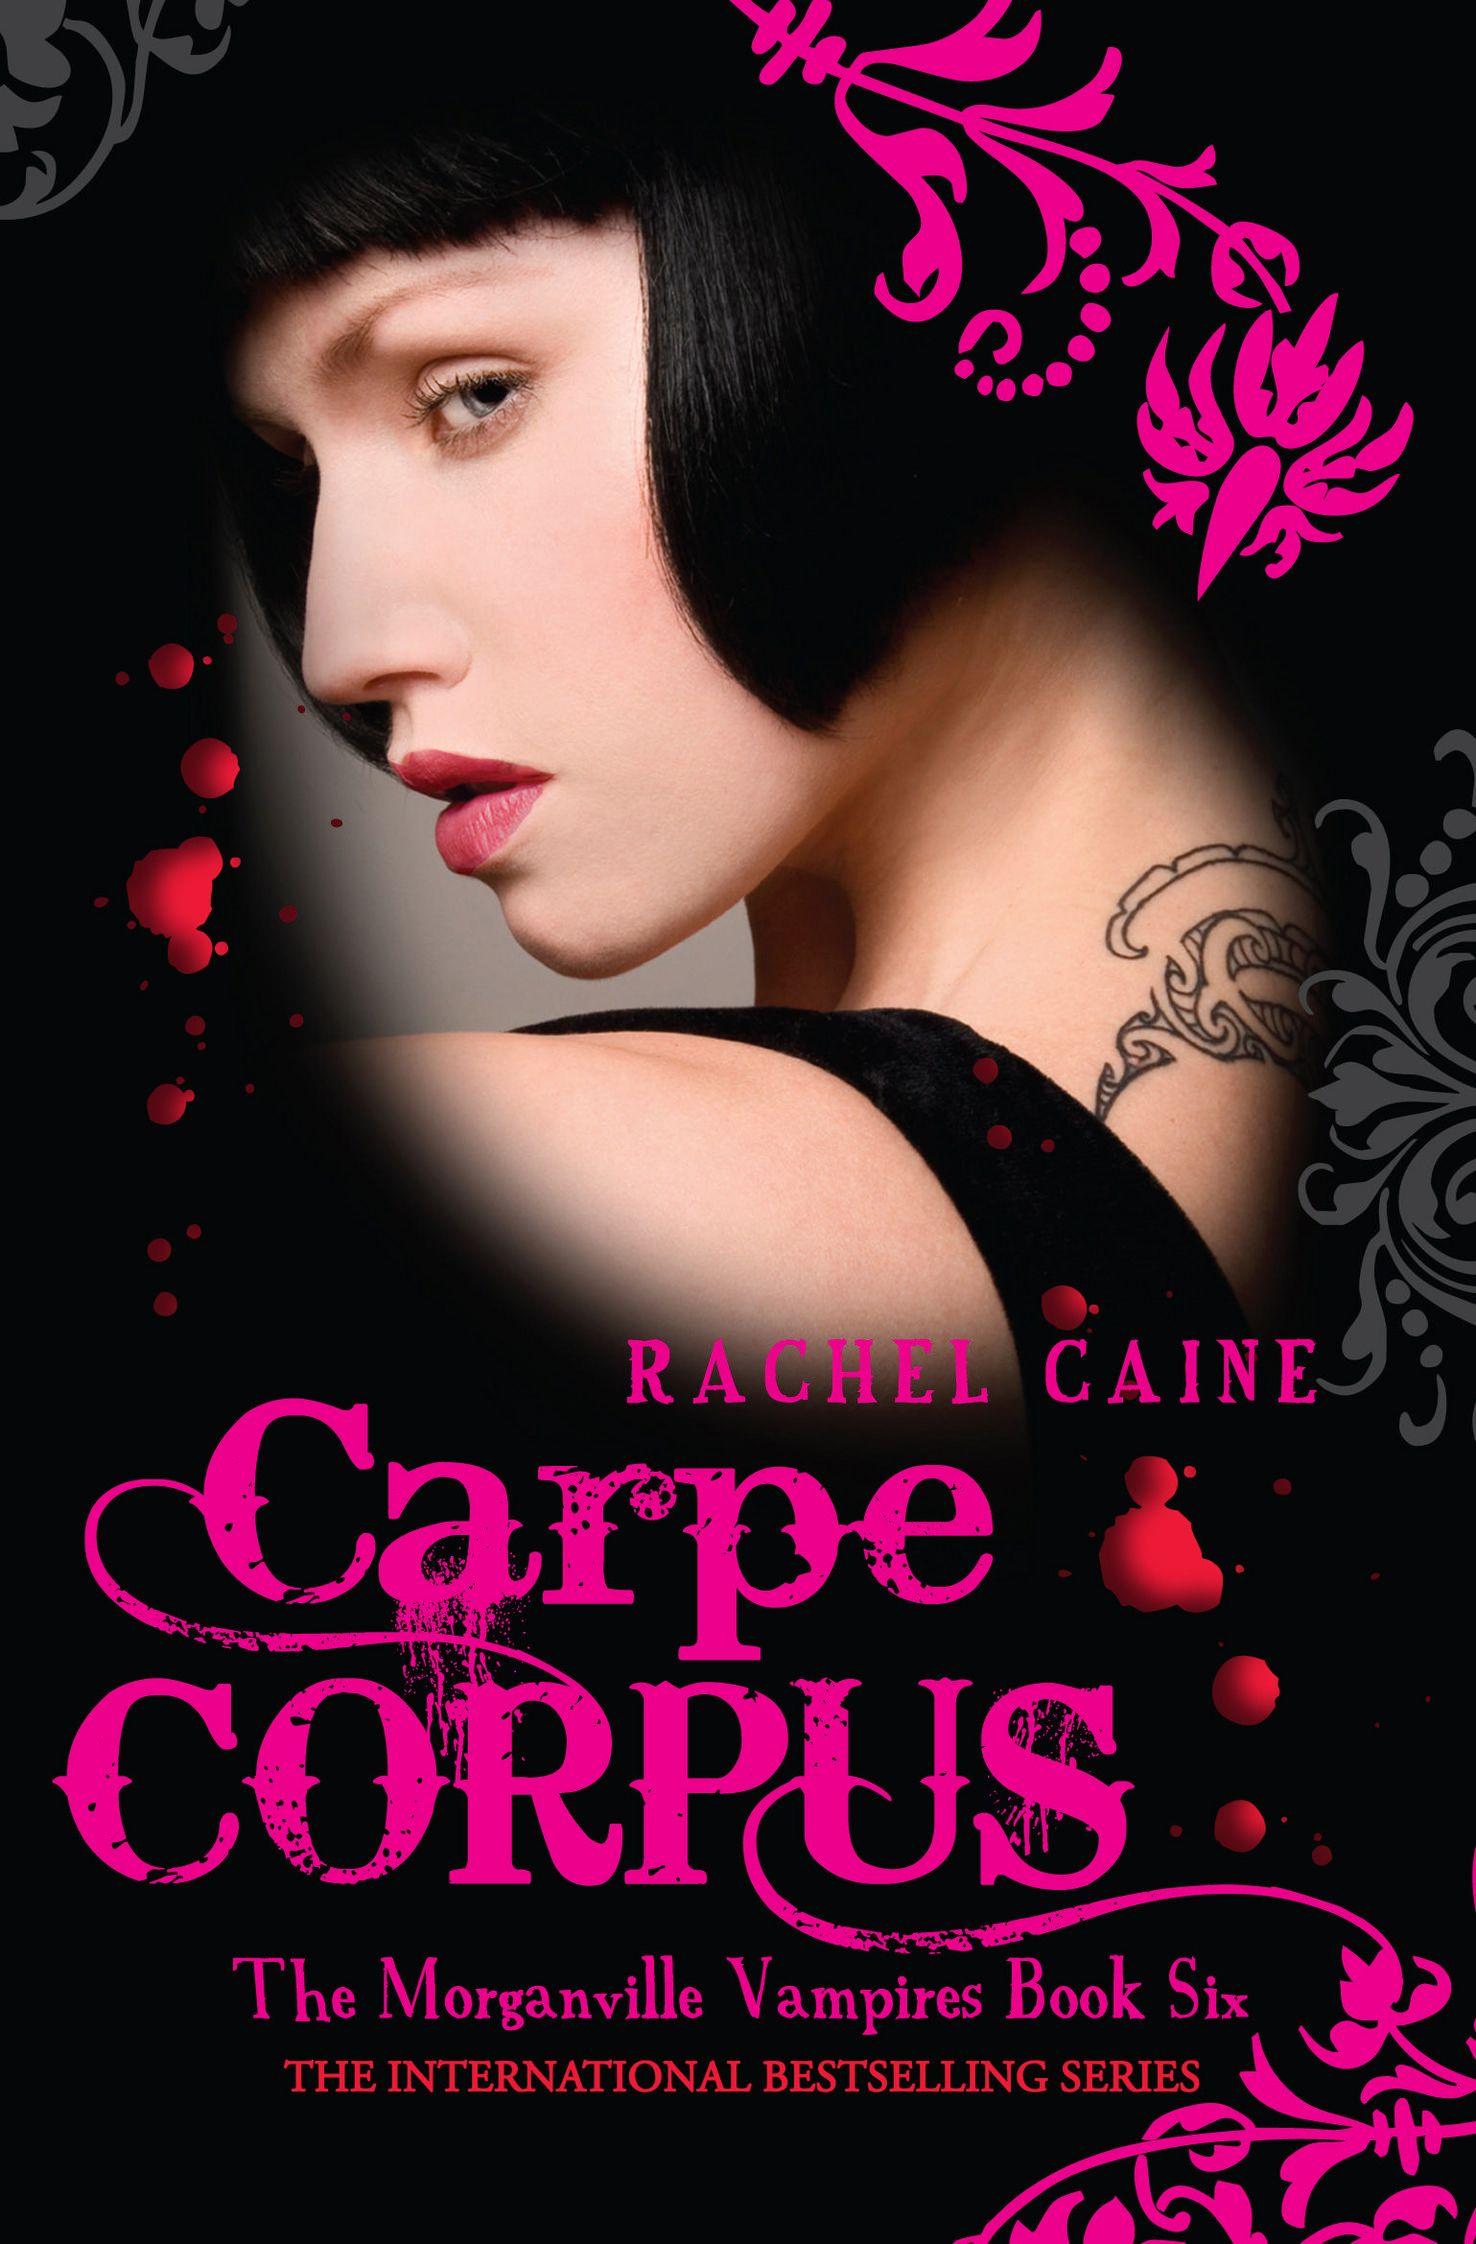 Carpe Corpus: The Morganville Vampires Book Six Ebook By Rachel Caine  Kobo